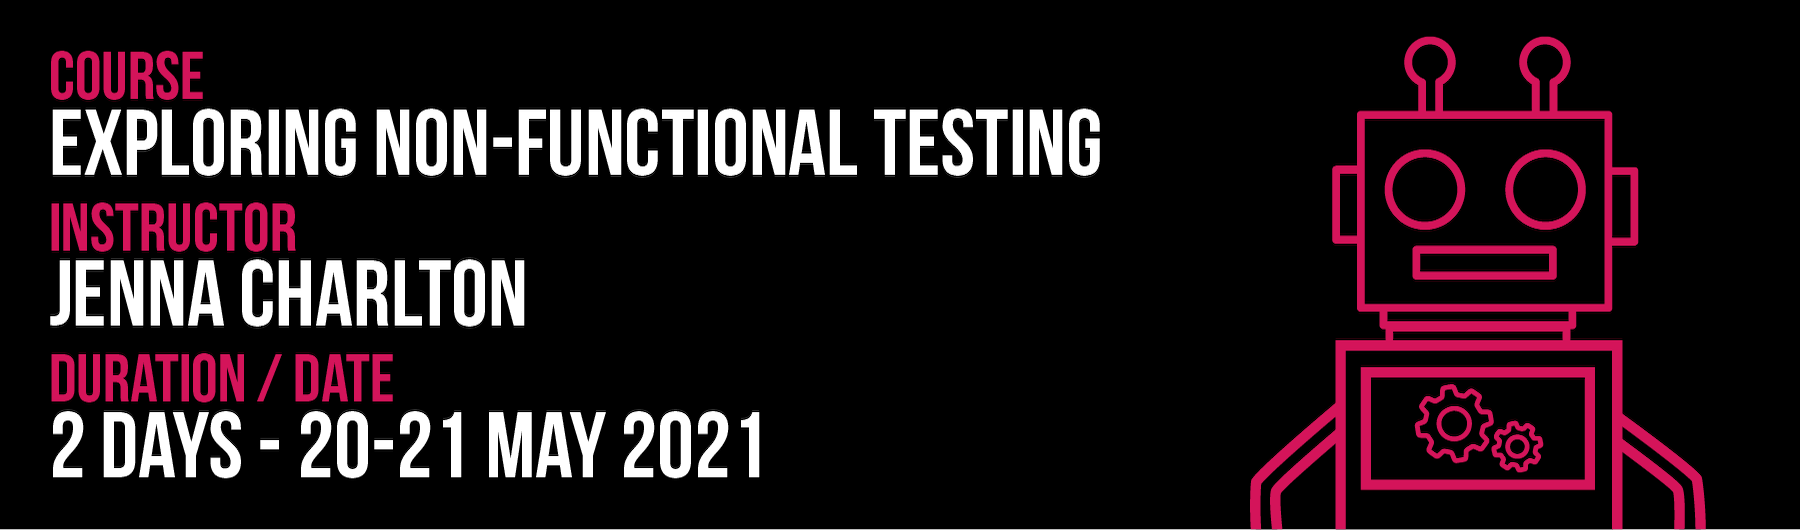 Exploring Non-Functional Testing May 2021